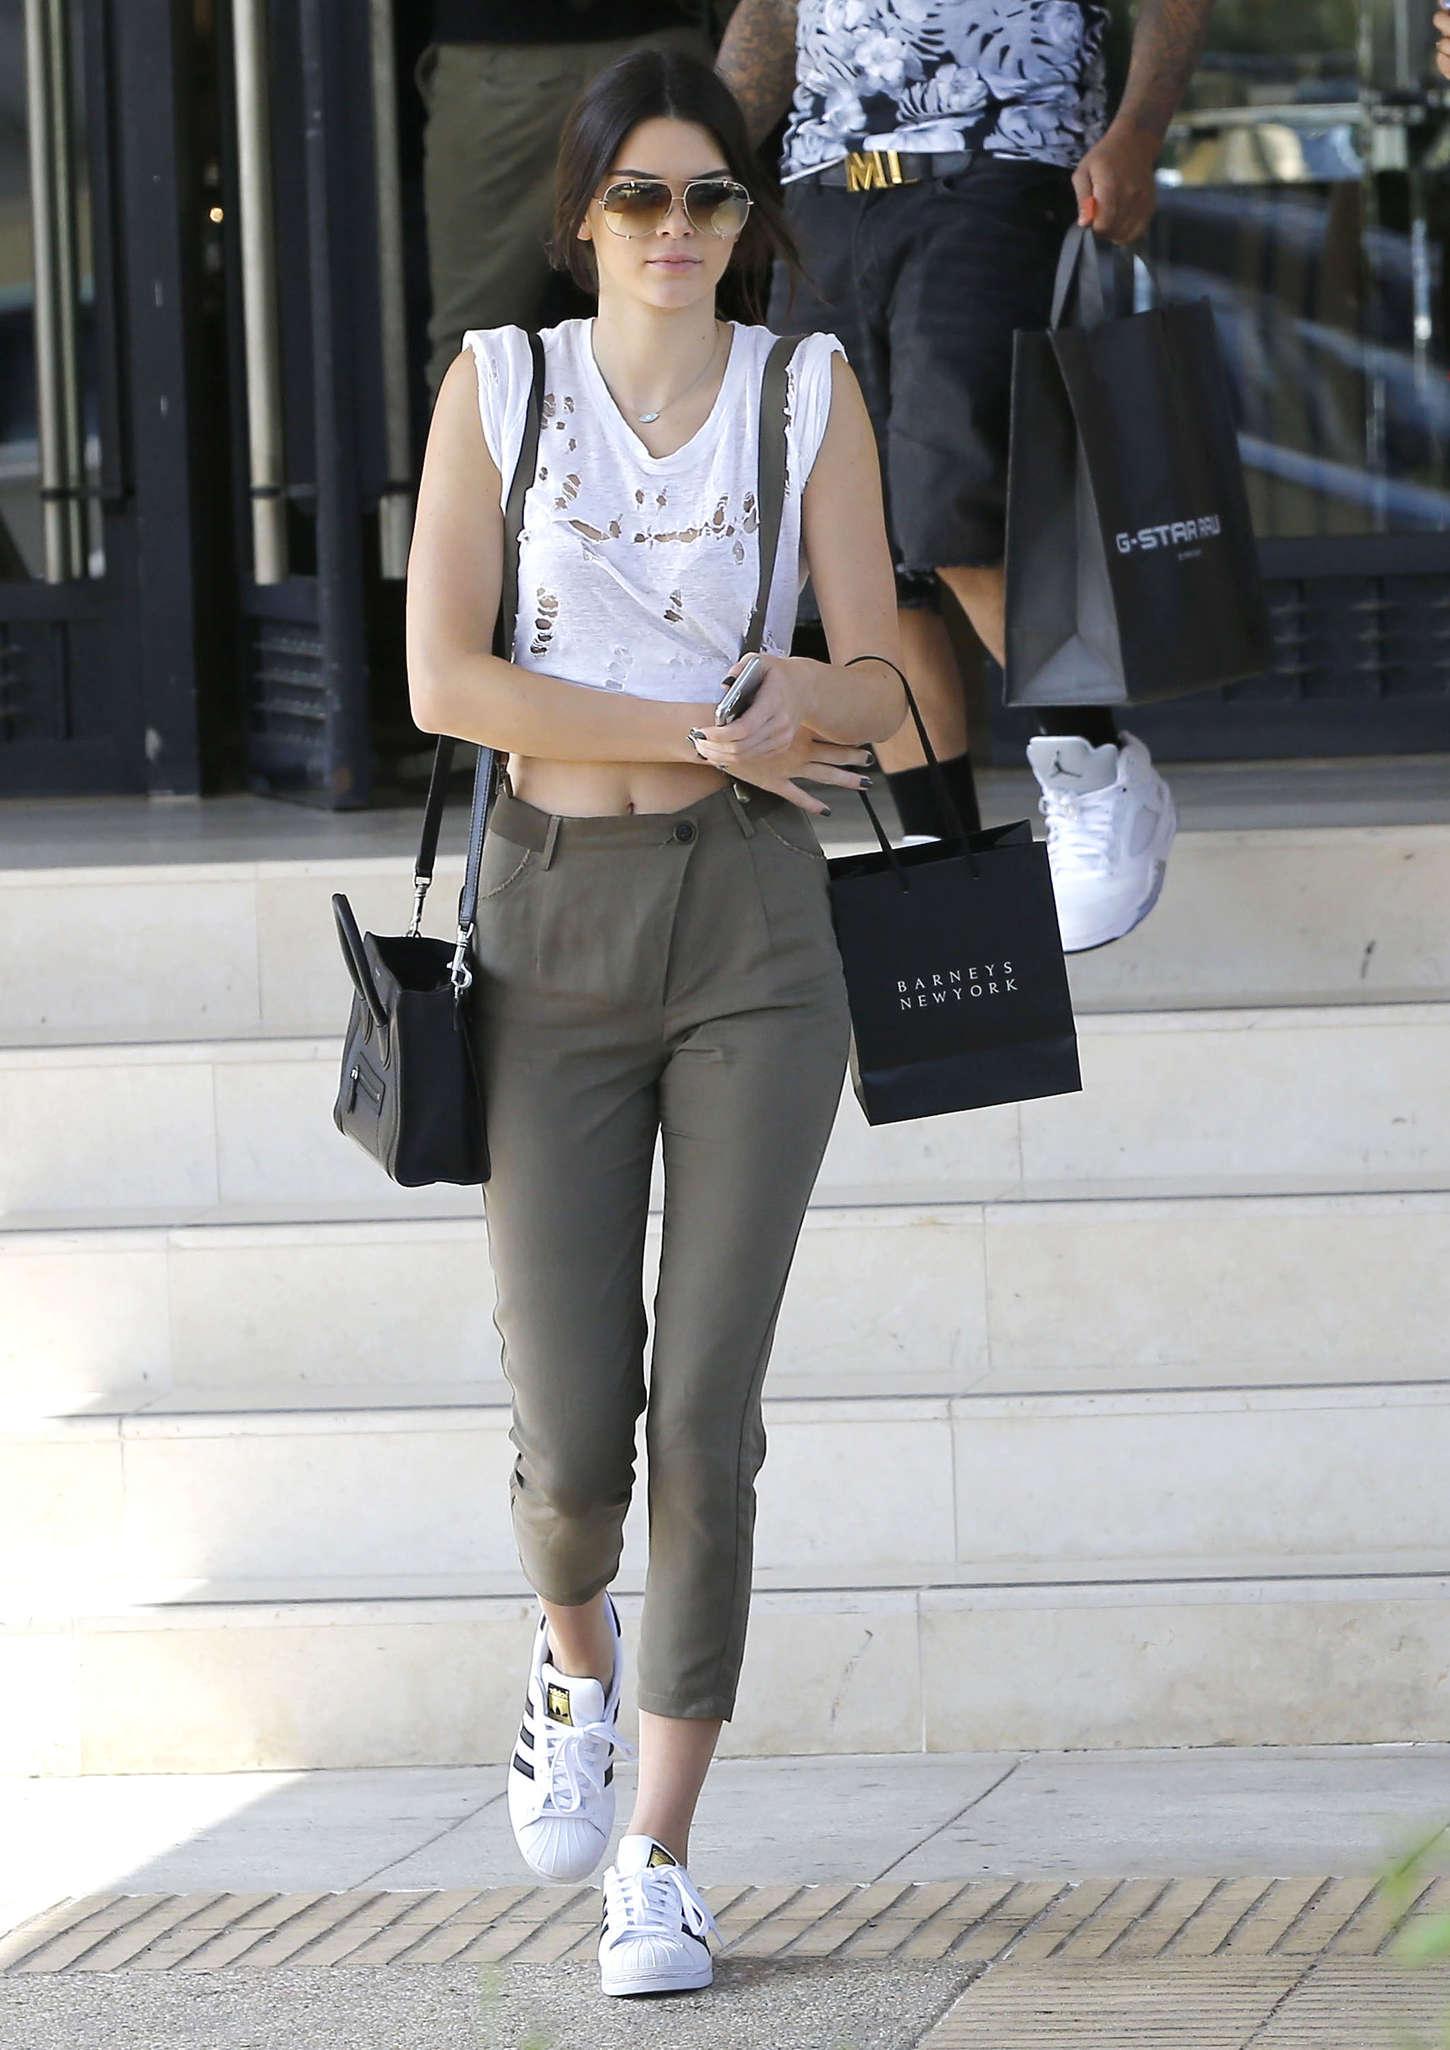 Kendall Jenner mang giày thể thao trắng Superstar cổ điển